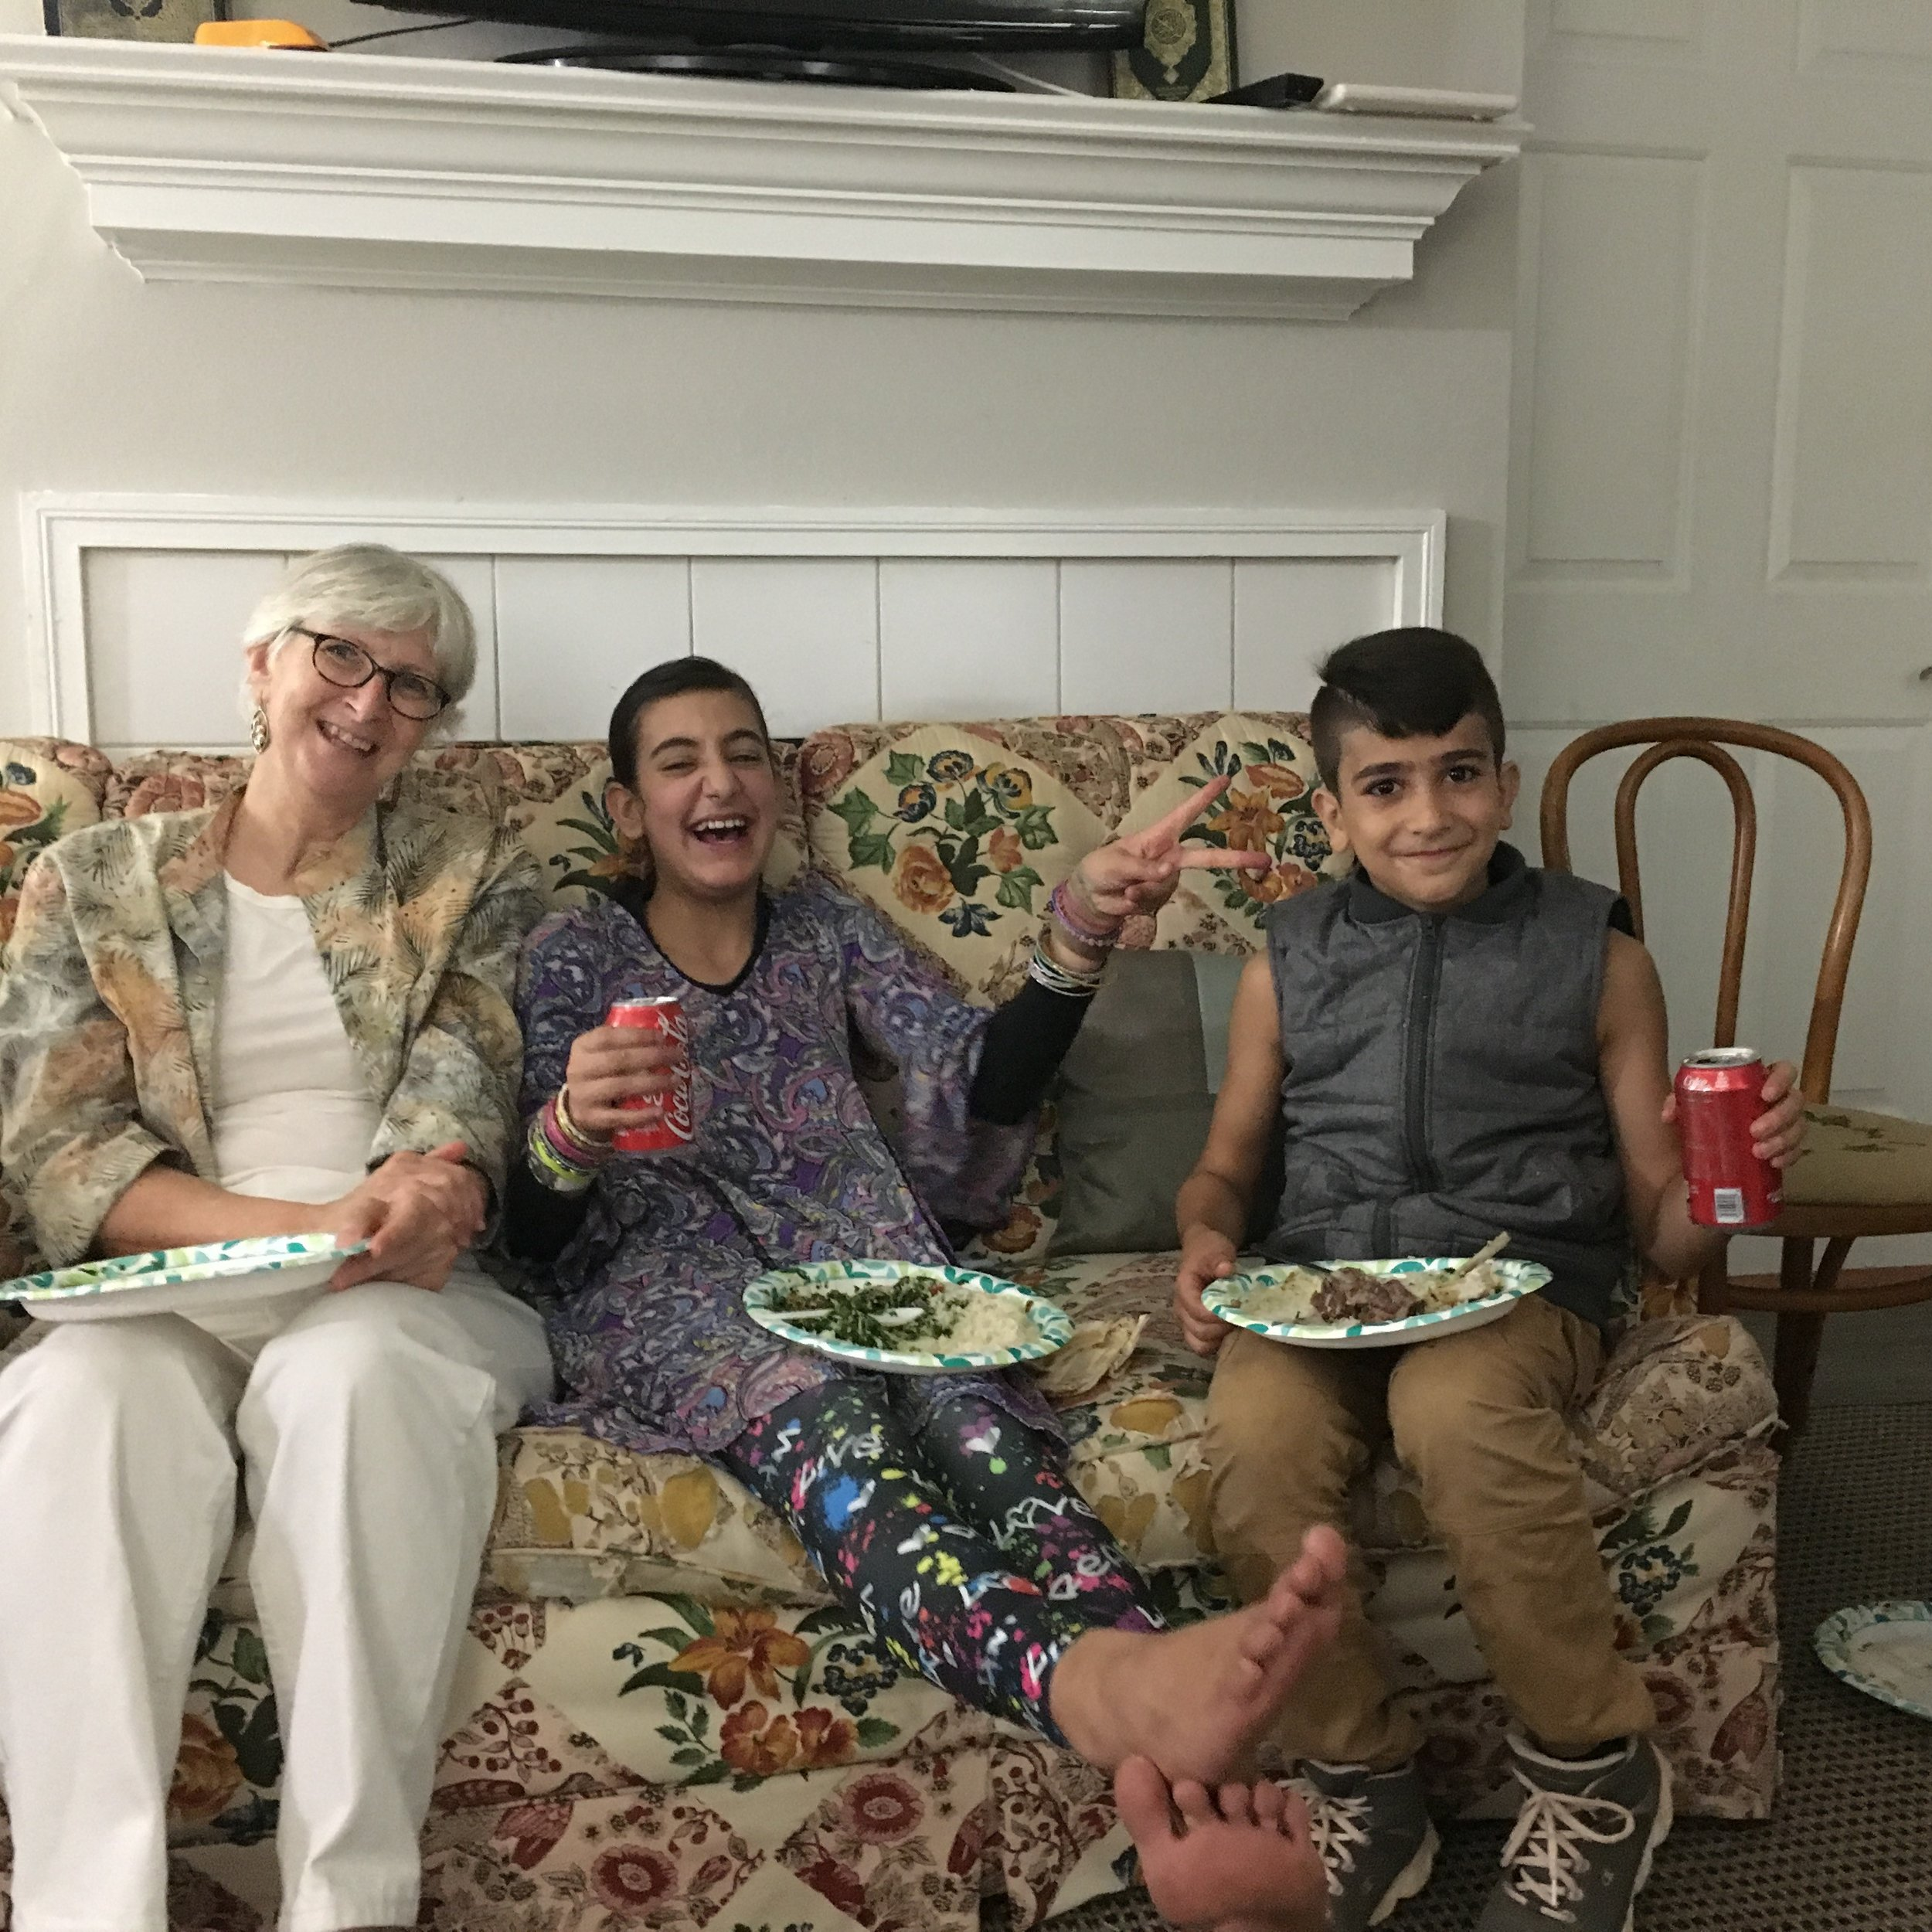 Volunteer Bev Arends at Obadah's 15th Birthday Party